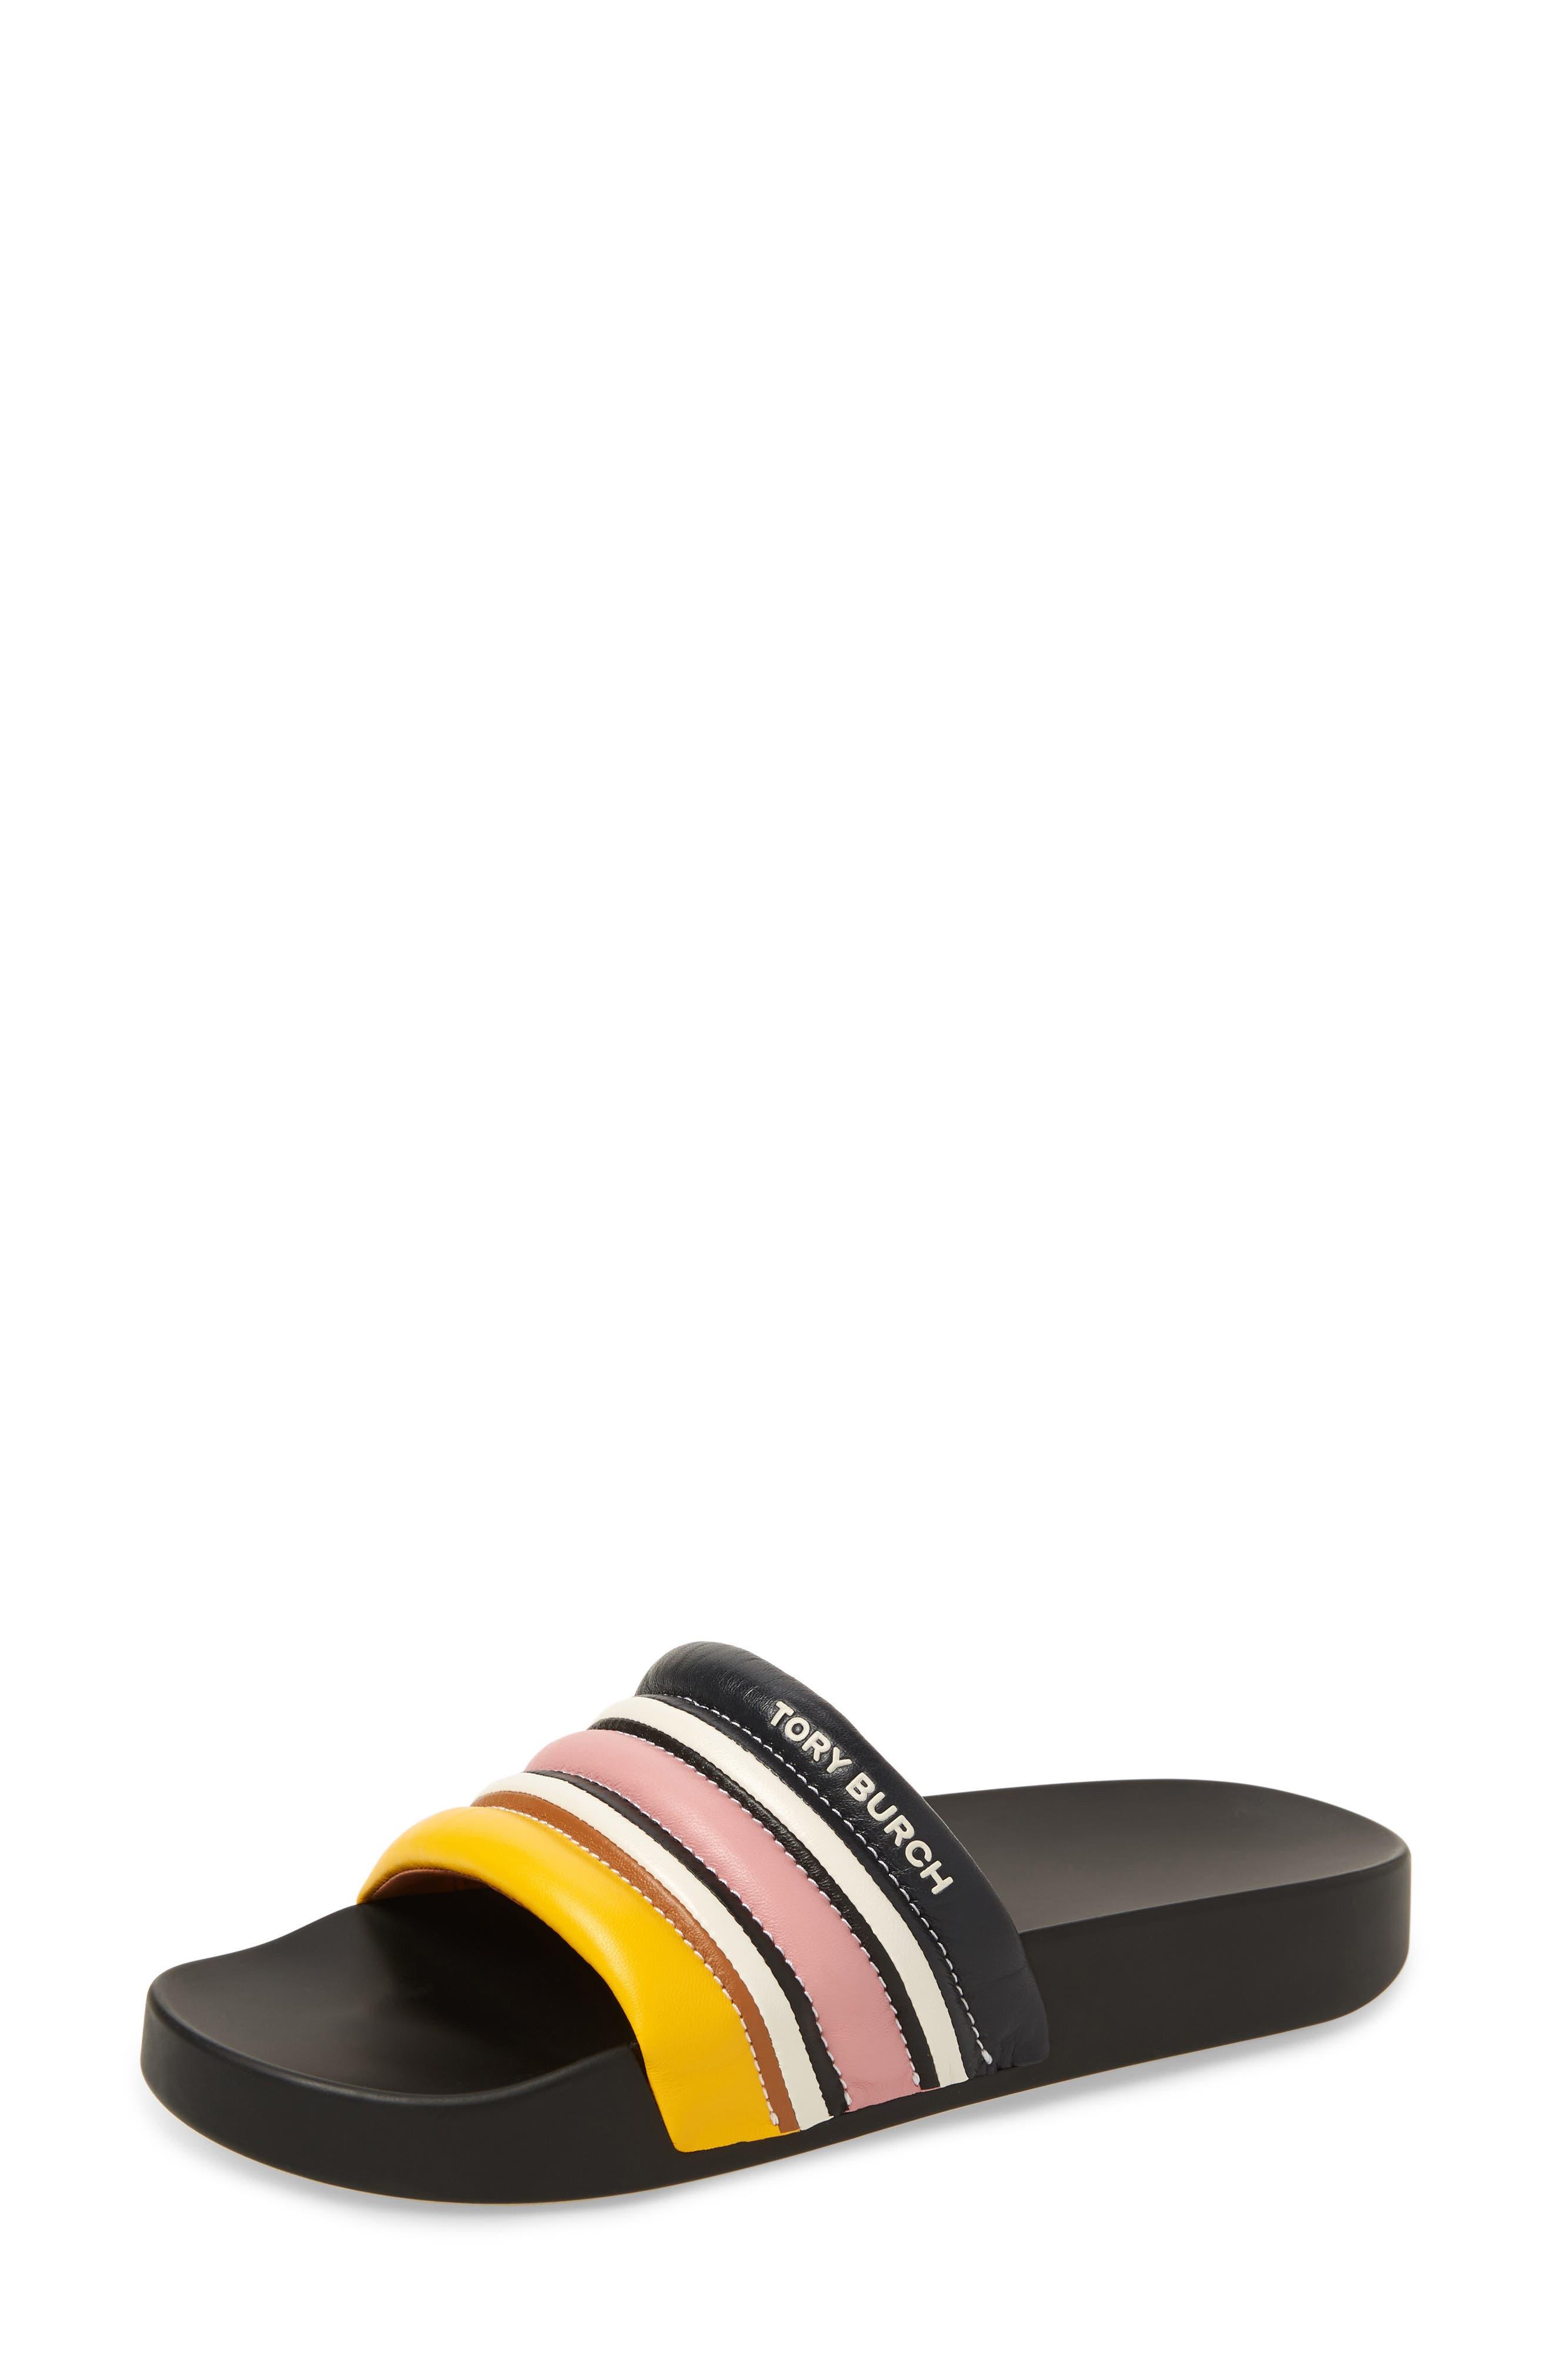 9f2c97cfc Women s Tory Burch Slide Sandals